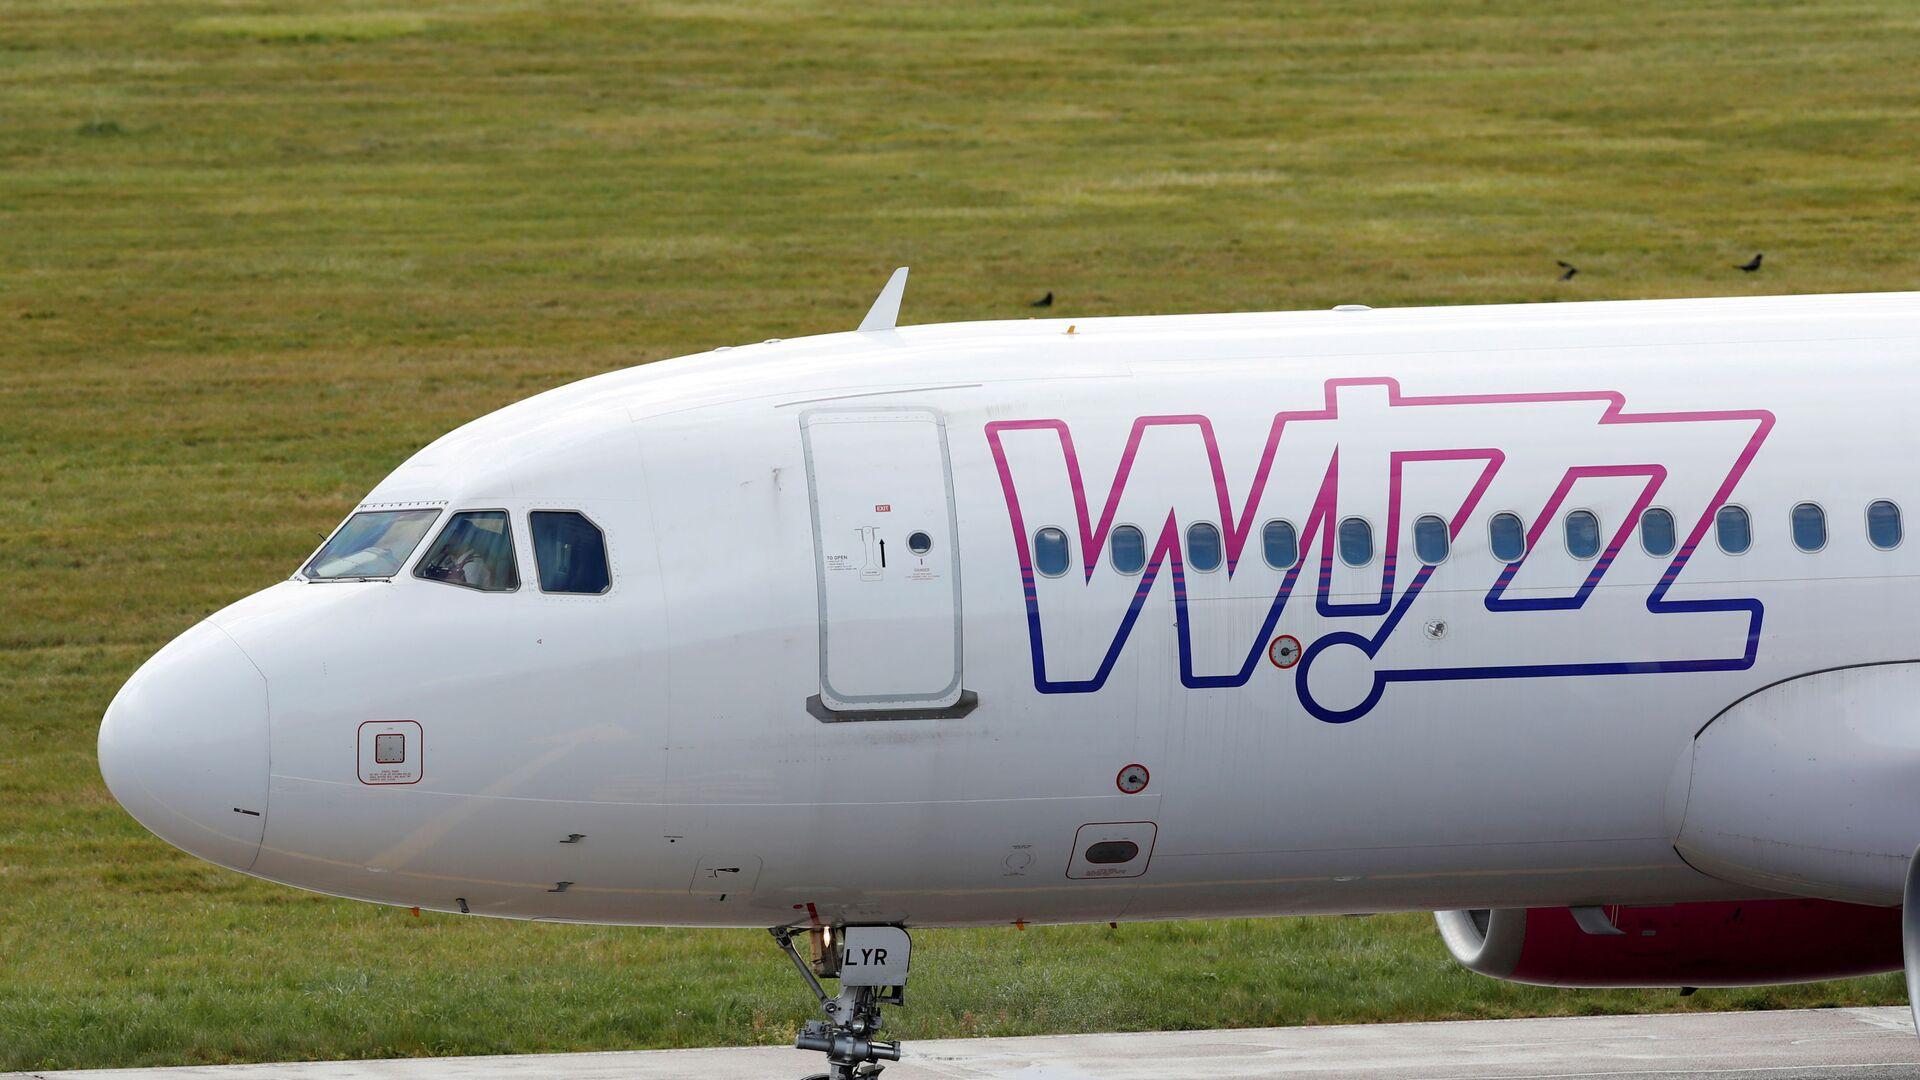 Letadlo Wizz Air - Sputnik Česká republika, 1920, 02.06.2021